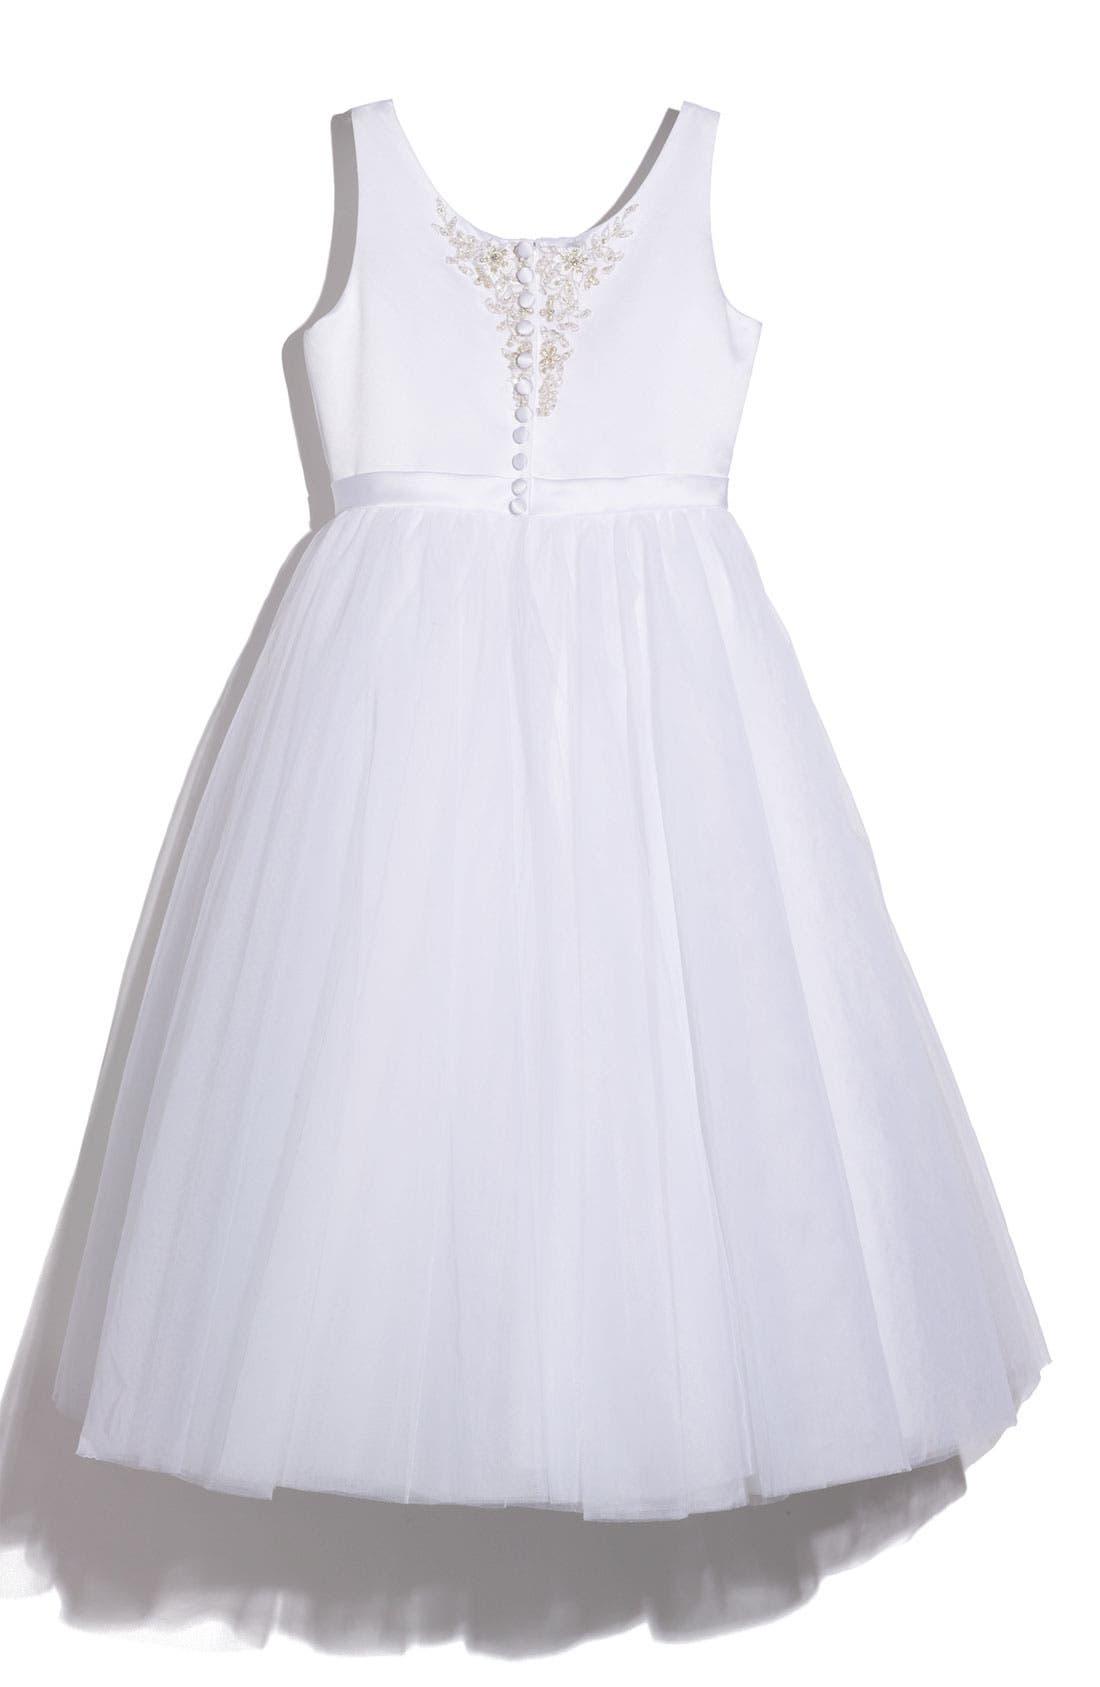 Alternate Image 2  - Joan Calabrese for Mon Cheri Satin Sequin Dress (Big Girls)